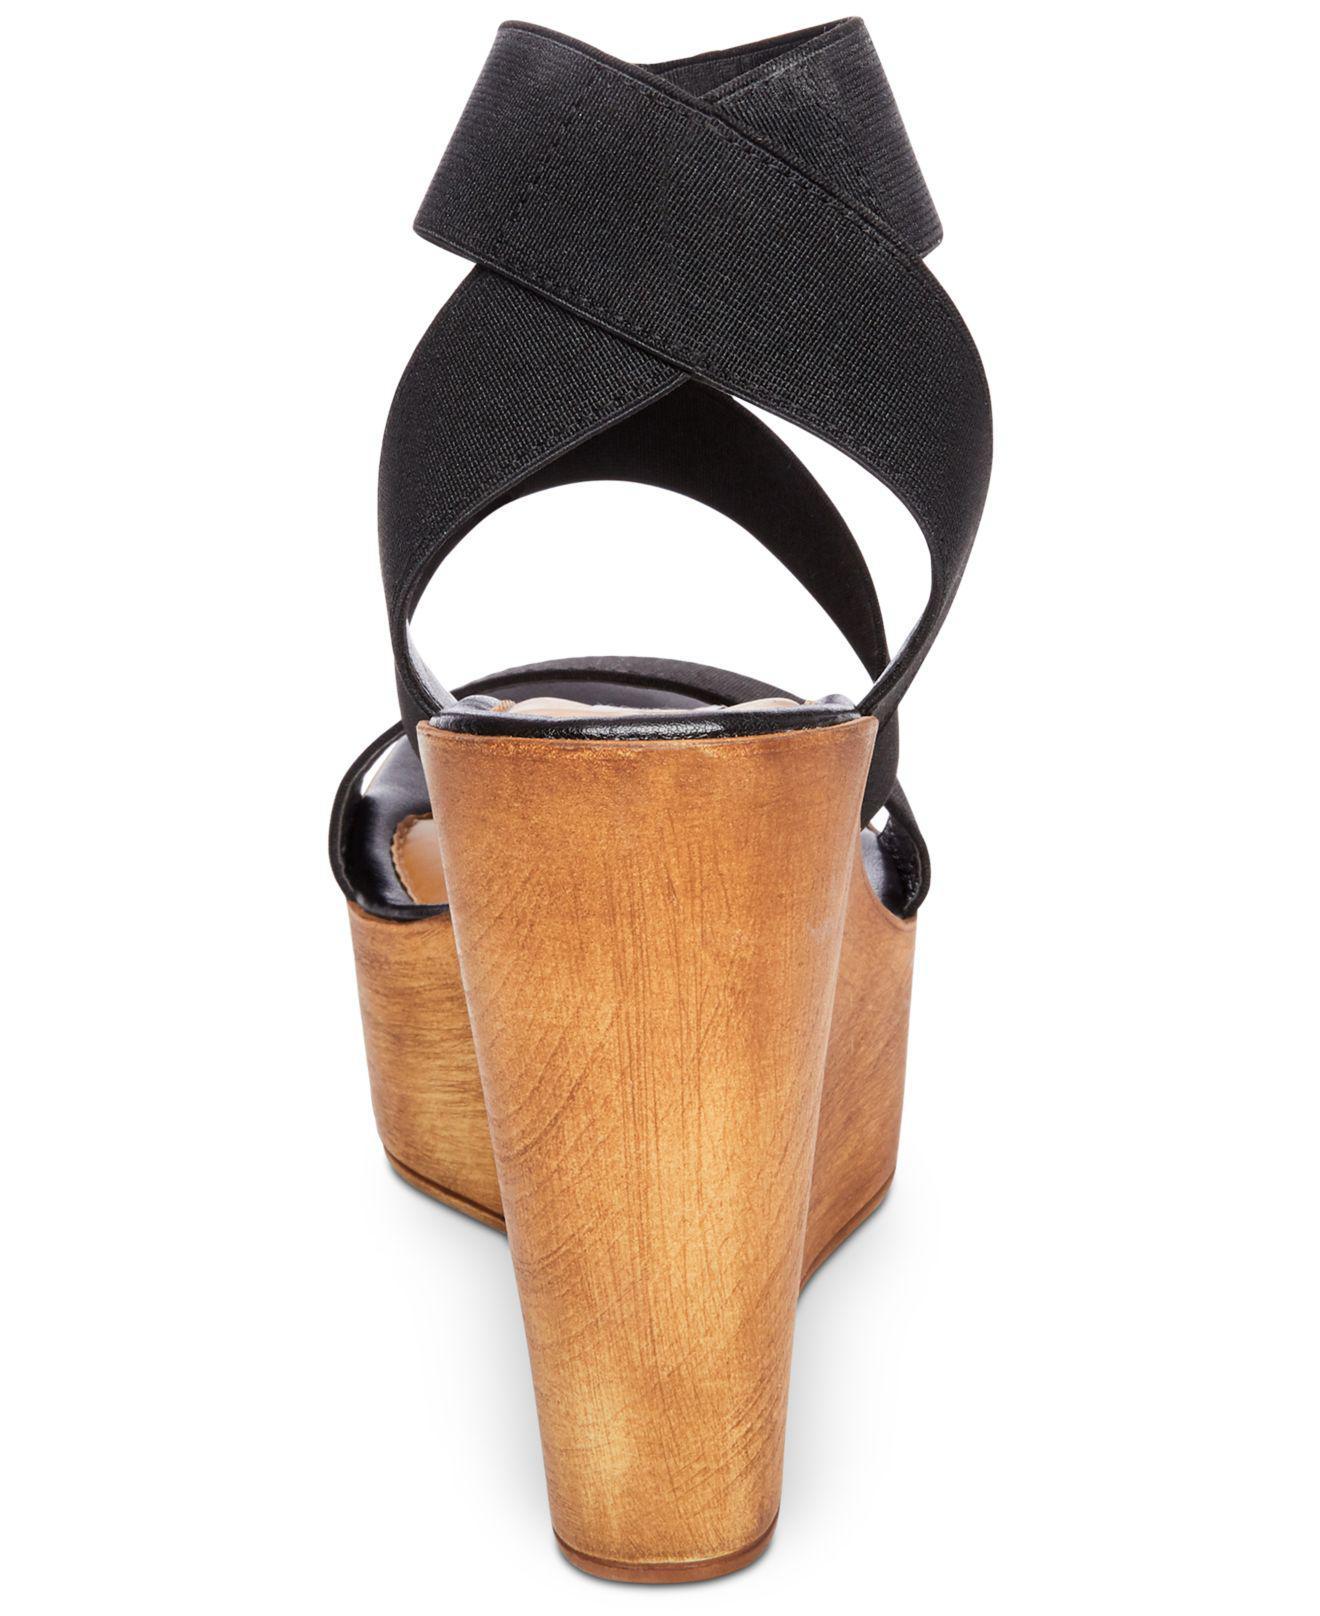 8fdde3bdbf61 Lyst - Steve Madden Blondy Platform Wedge Sandals in Black